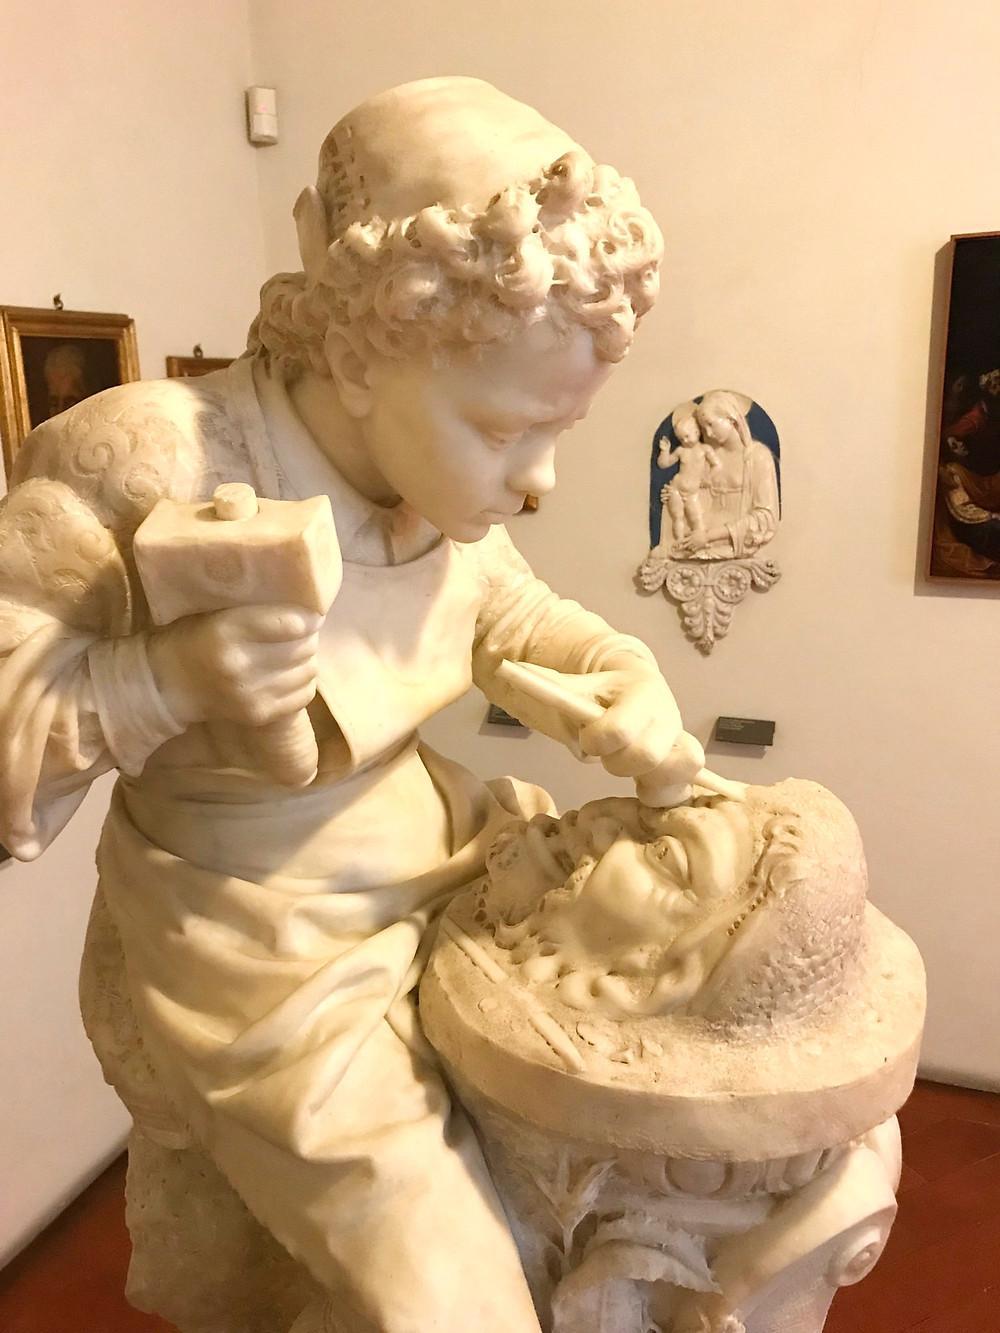 Emilio Zocchi, Michelangelo Sculpting the Head of a Fawn